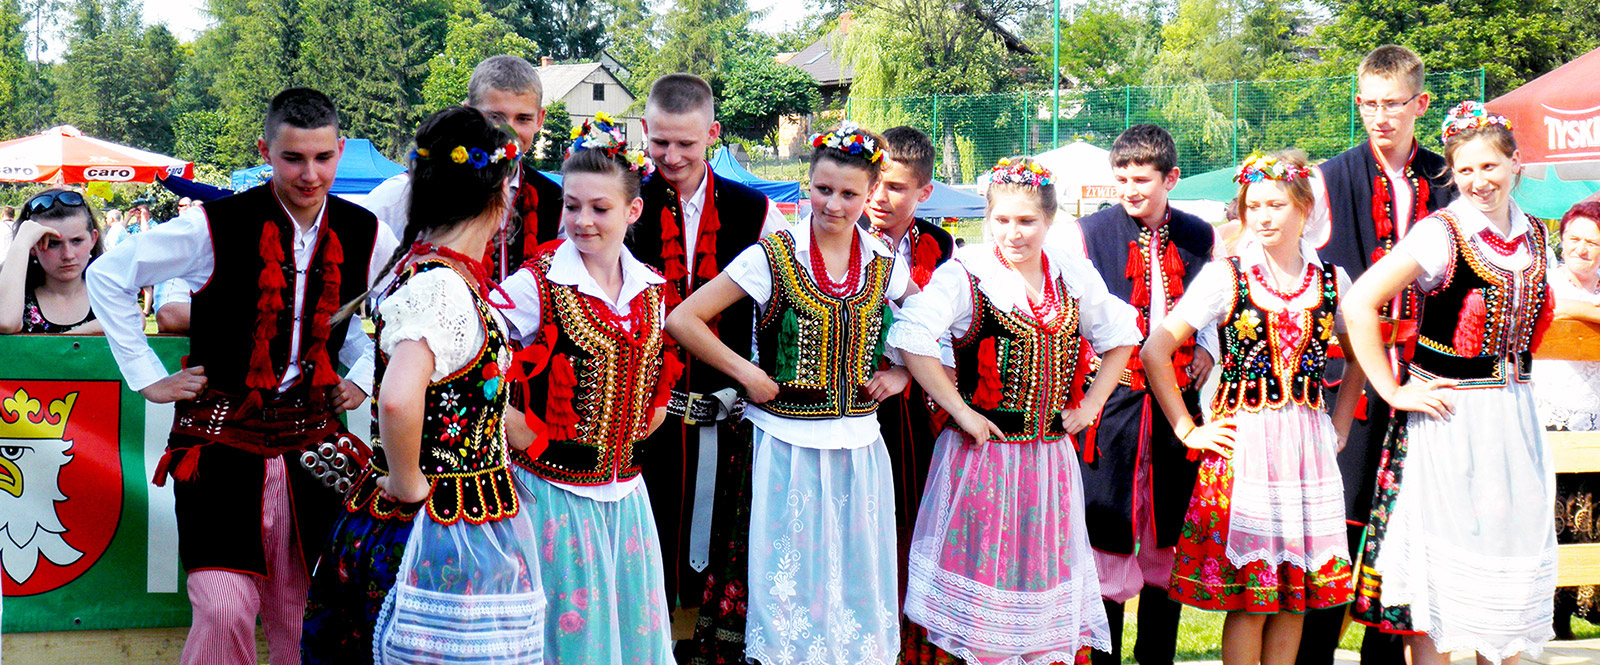 festiwal godki krakowskiej